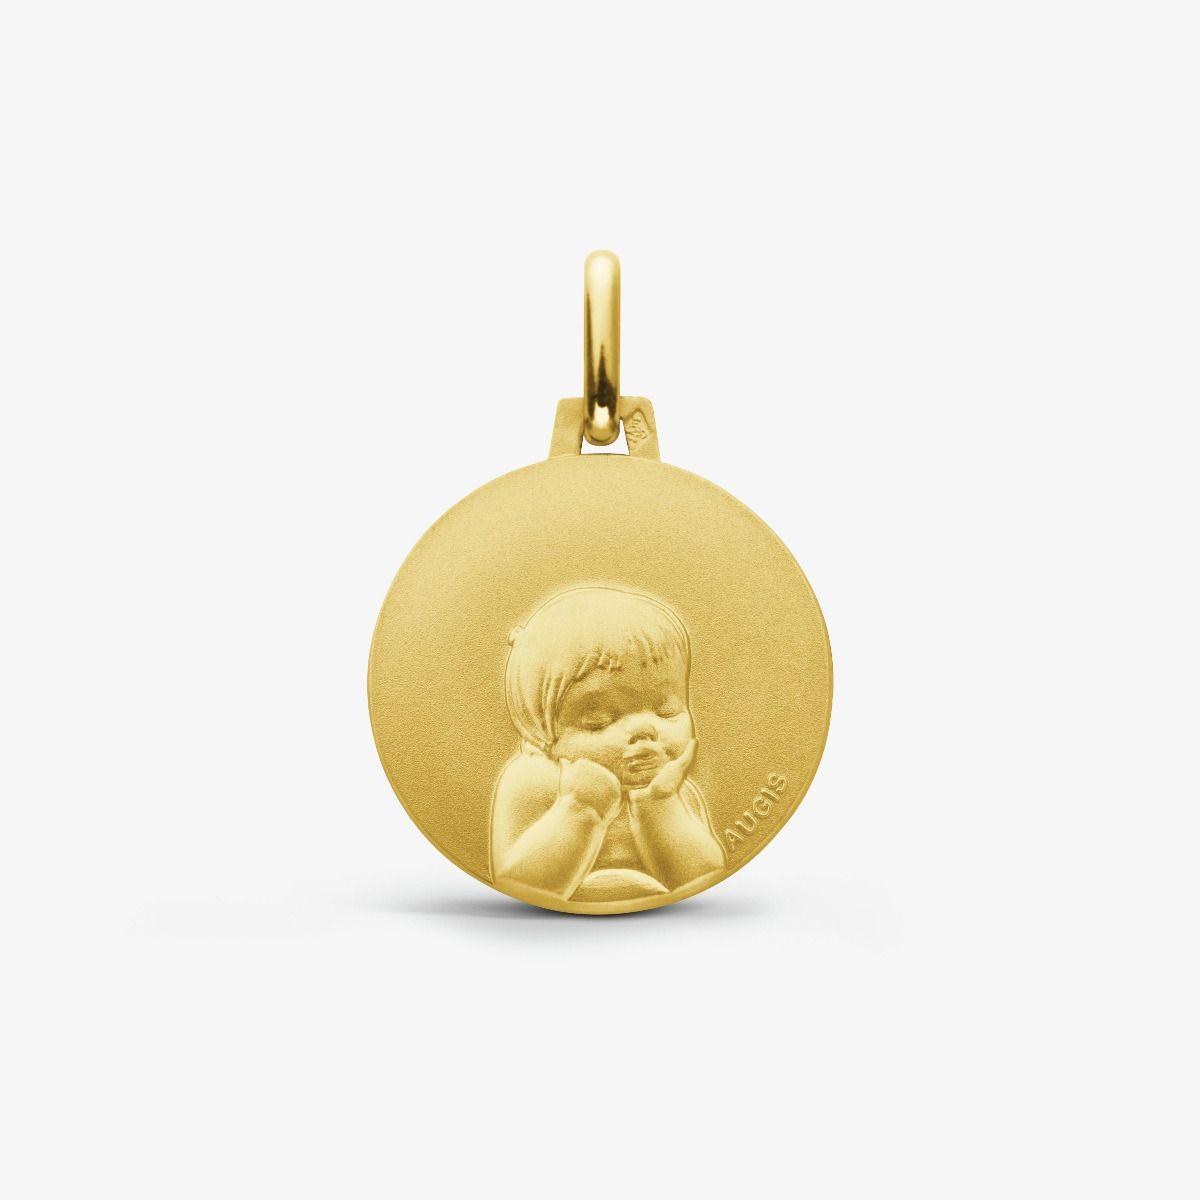 Médaille Chérubin Or Jaune 18 carats - 16 mm